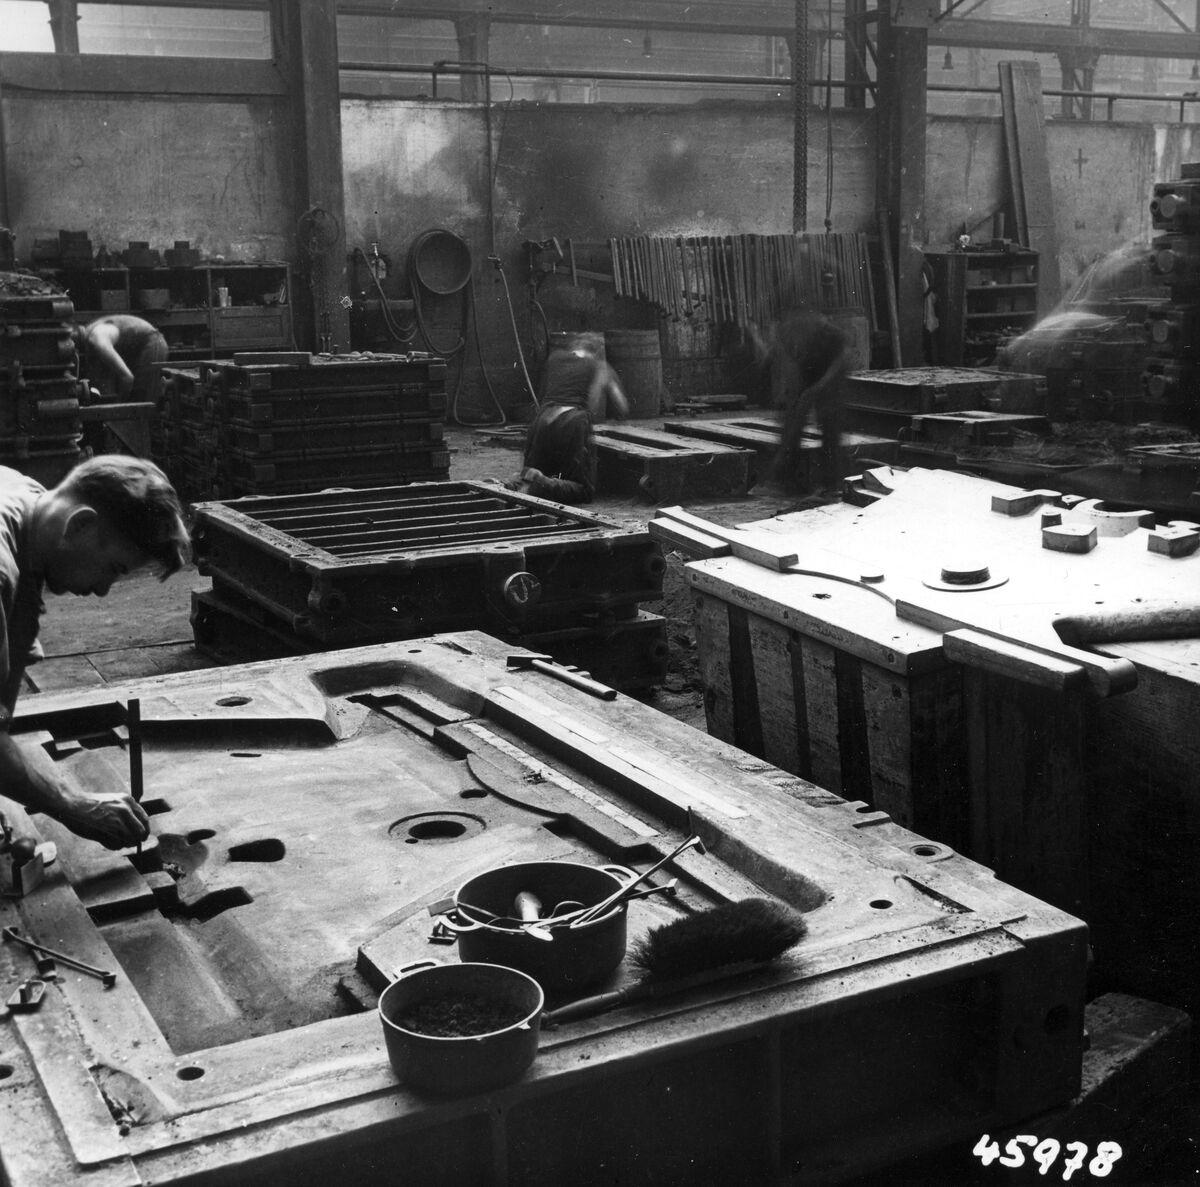 GFA 12/45978: Reportage casting process in malleable casting